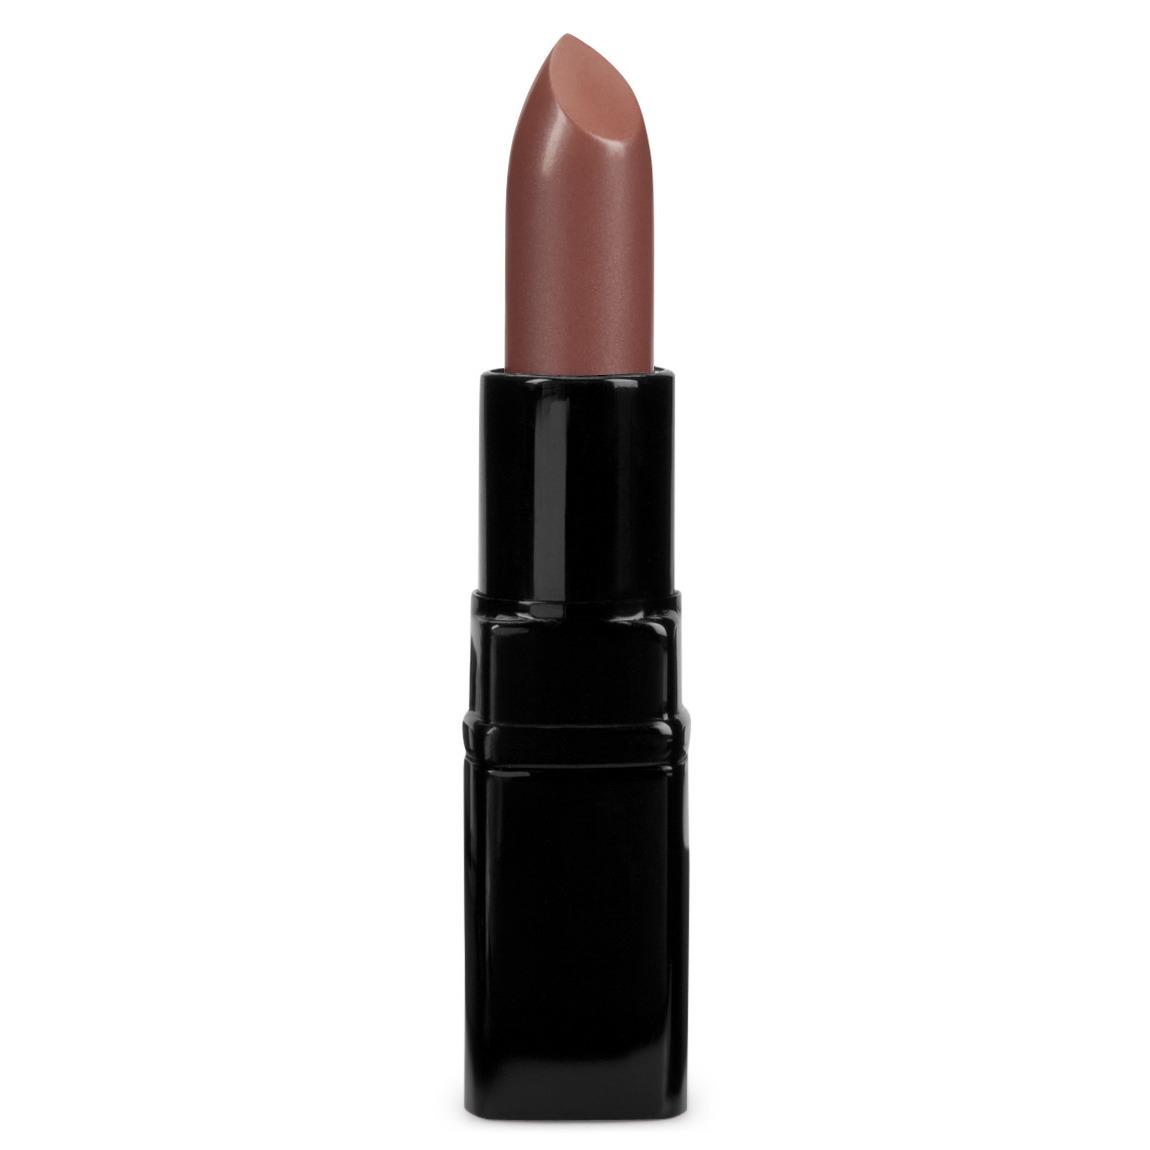 Inglot Cosmetics Lipstick 220 Cream